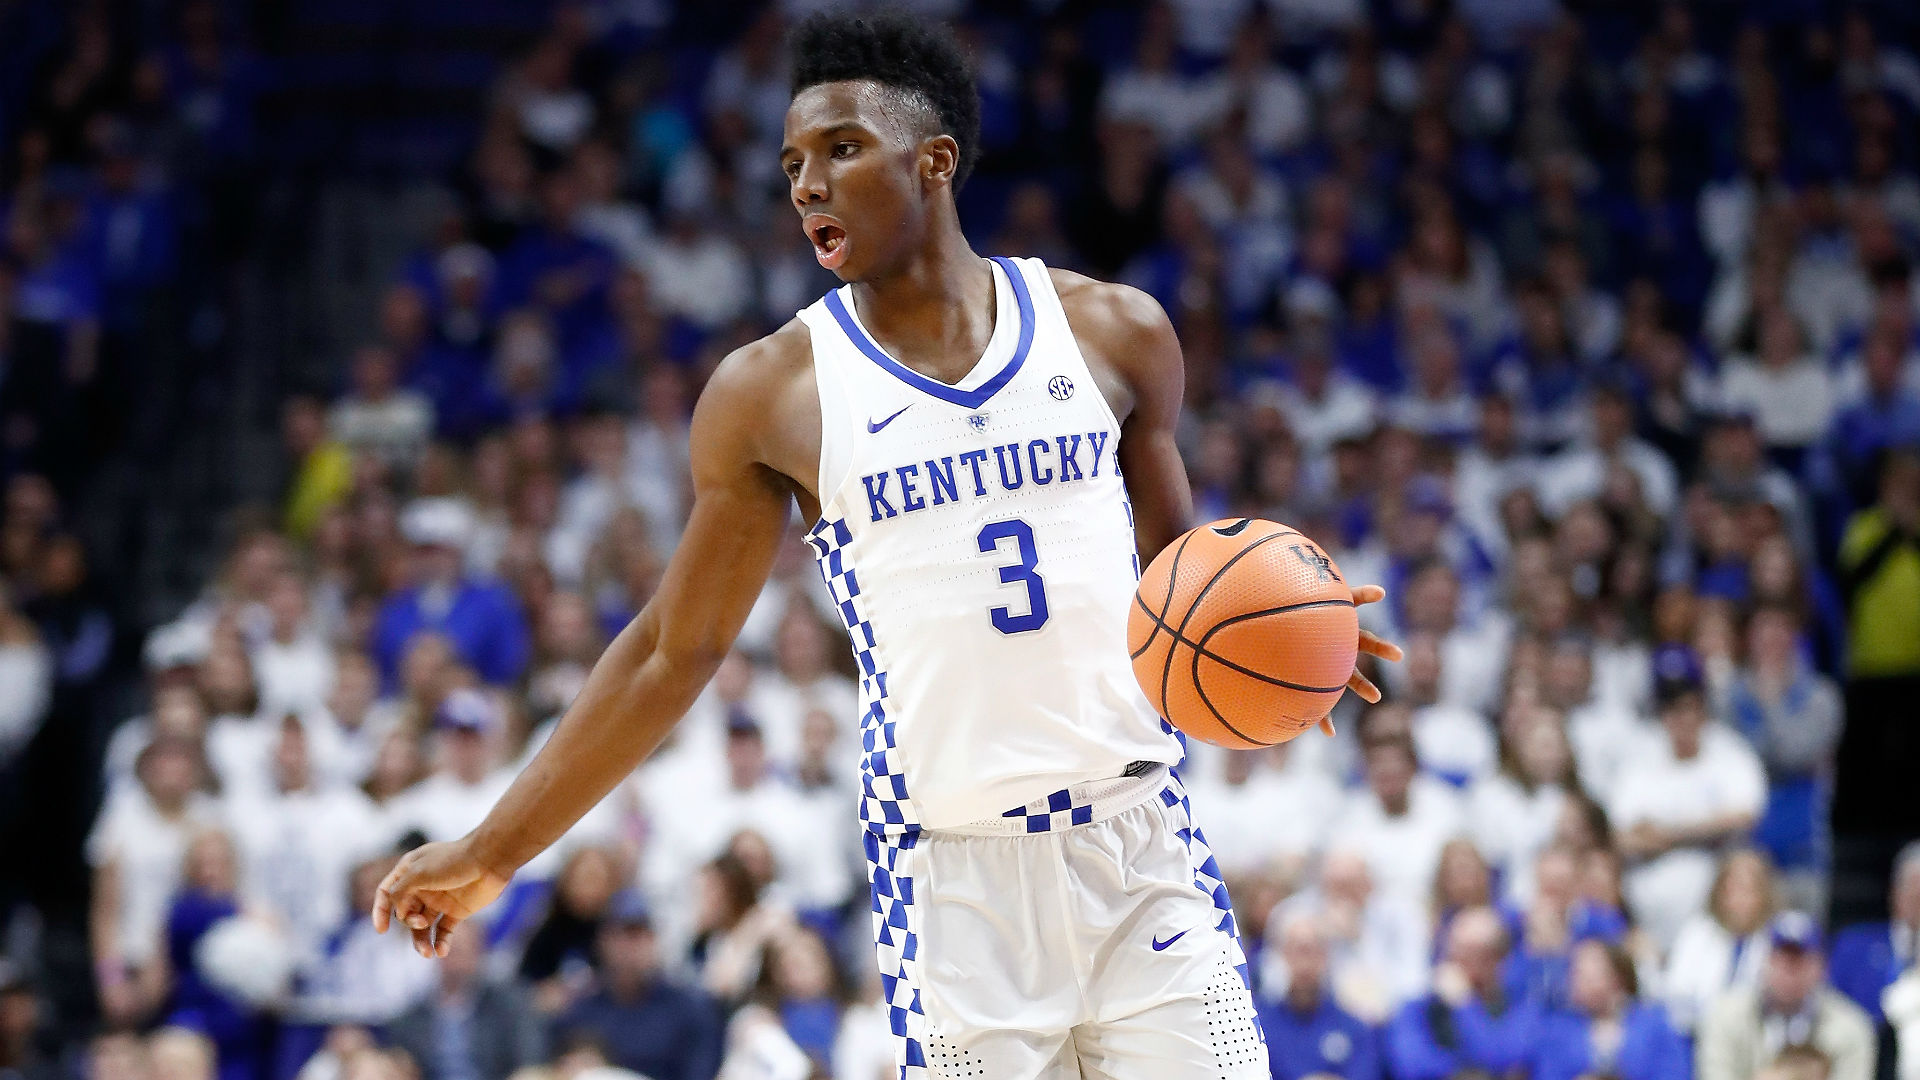 Hornets trade second-round pick Hamidou Diallo to Thunder